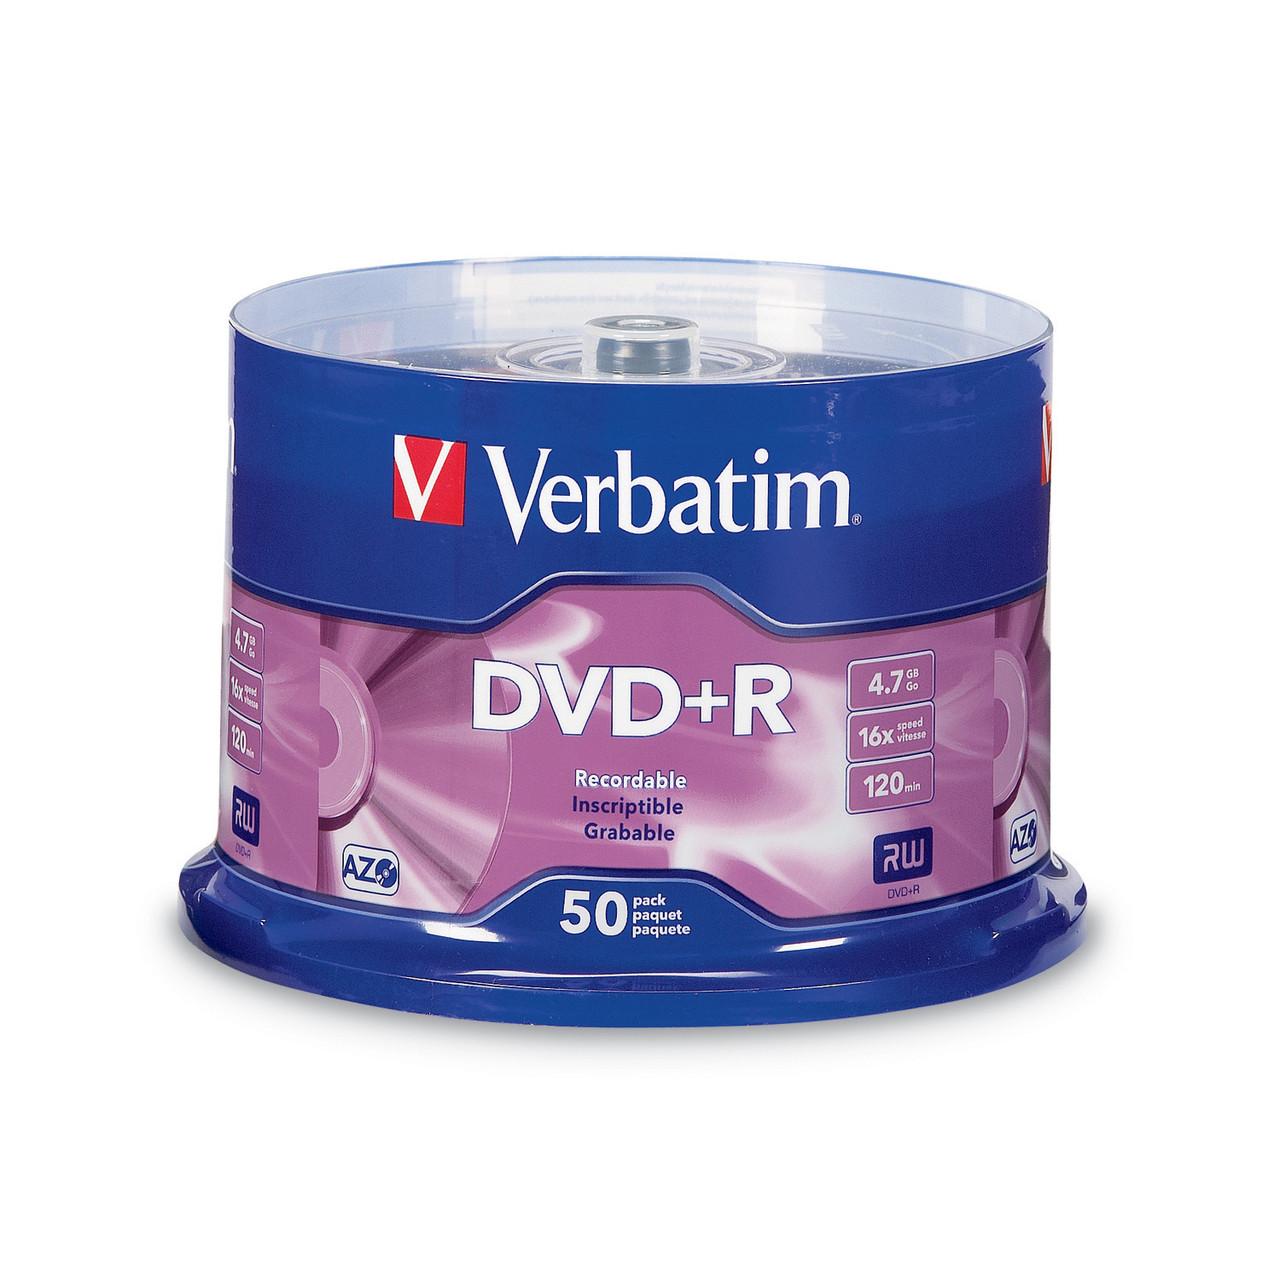 Verbatim DVD+R - 4.7GB Spindle 16X (1 Pack of 50 Pieces)